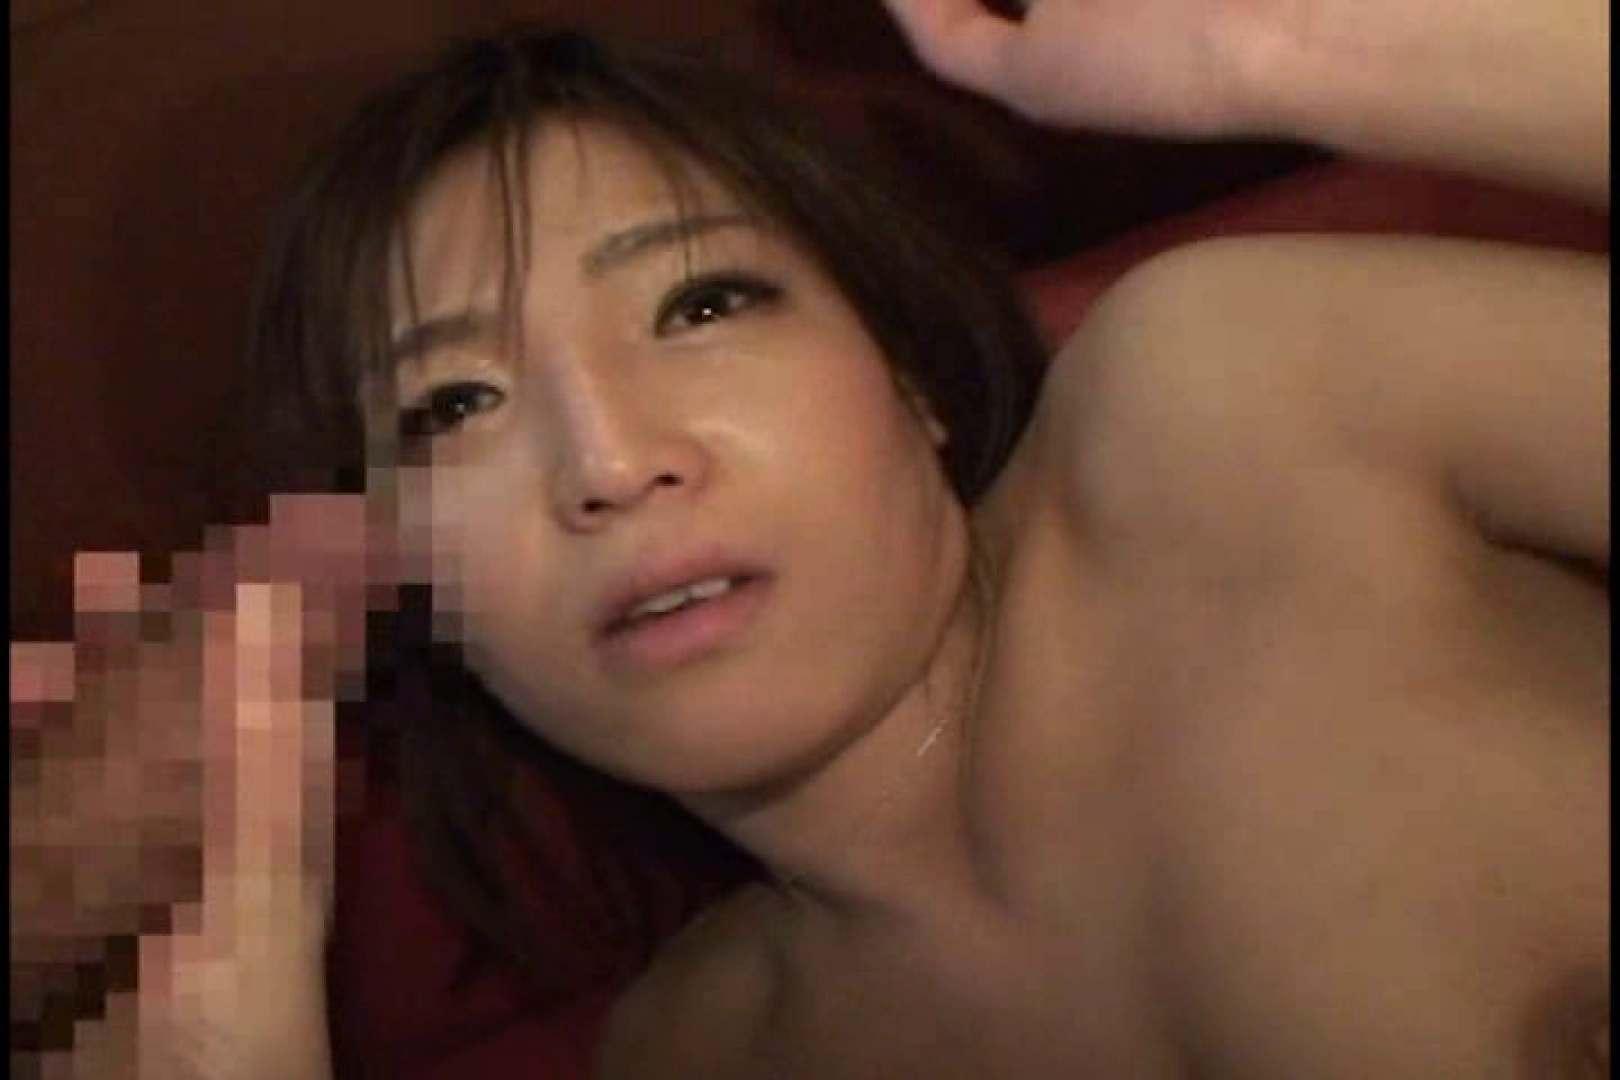 JDハンター全国ツアー vol.016 前編 女子大生のエロ動画 | 0  77PIX 63